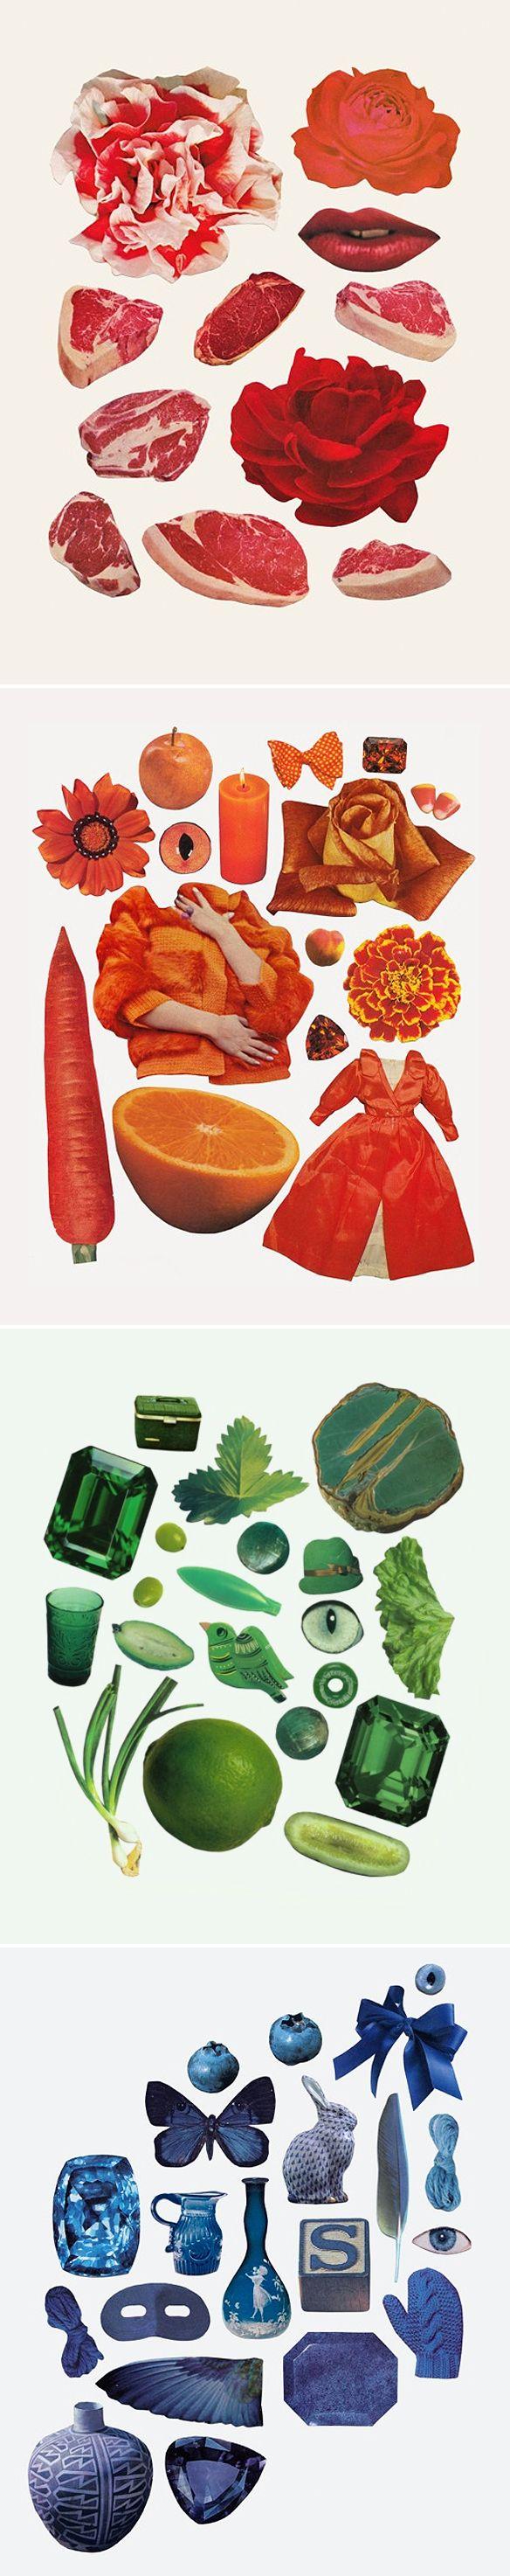 Best 25+ Collage ideas on Pinterest